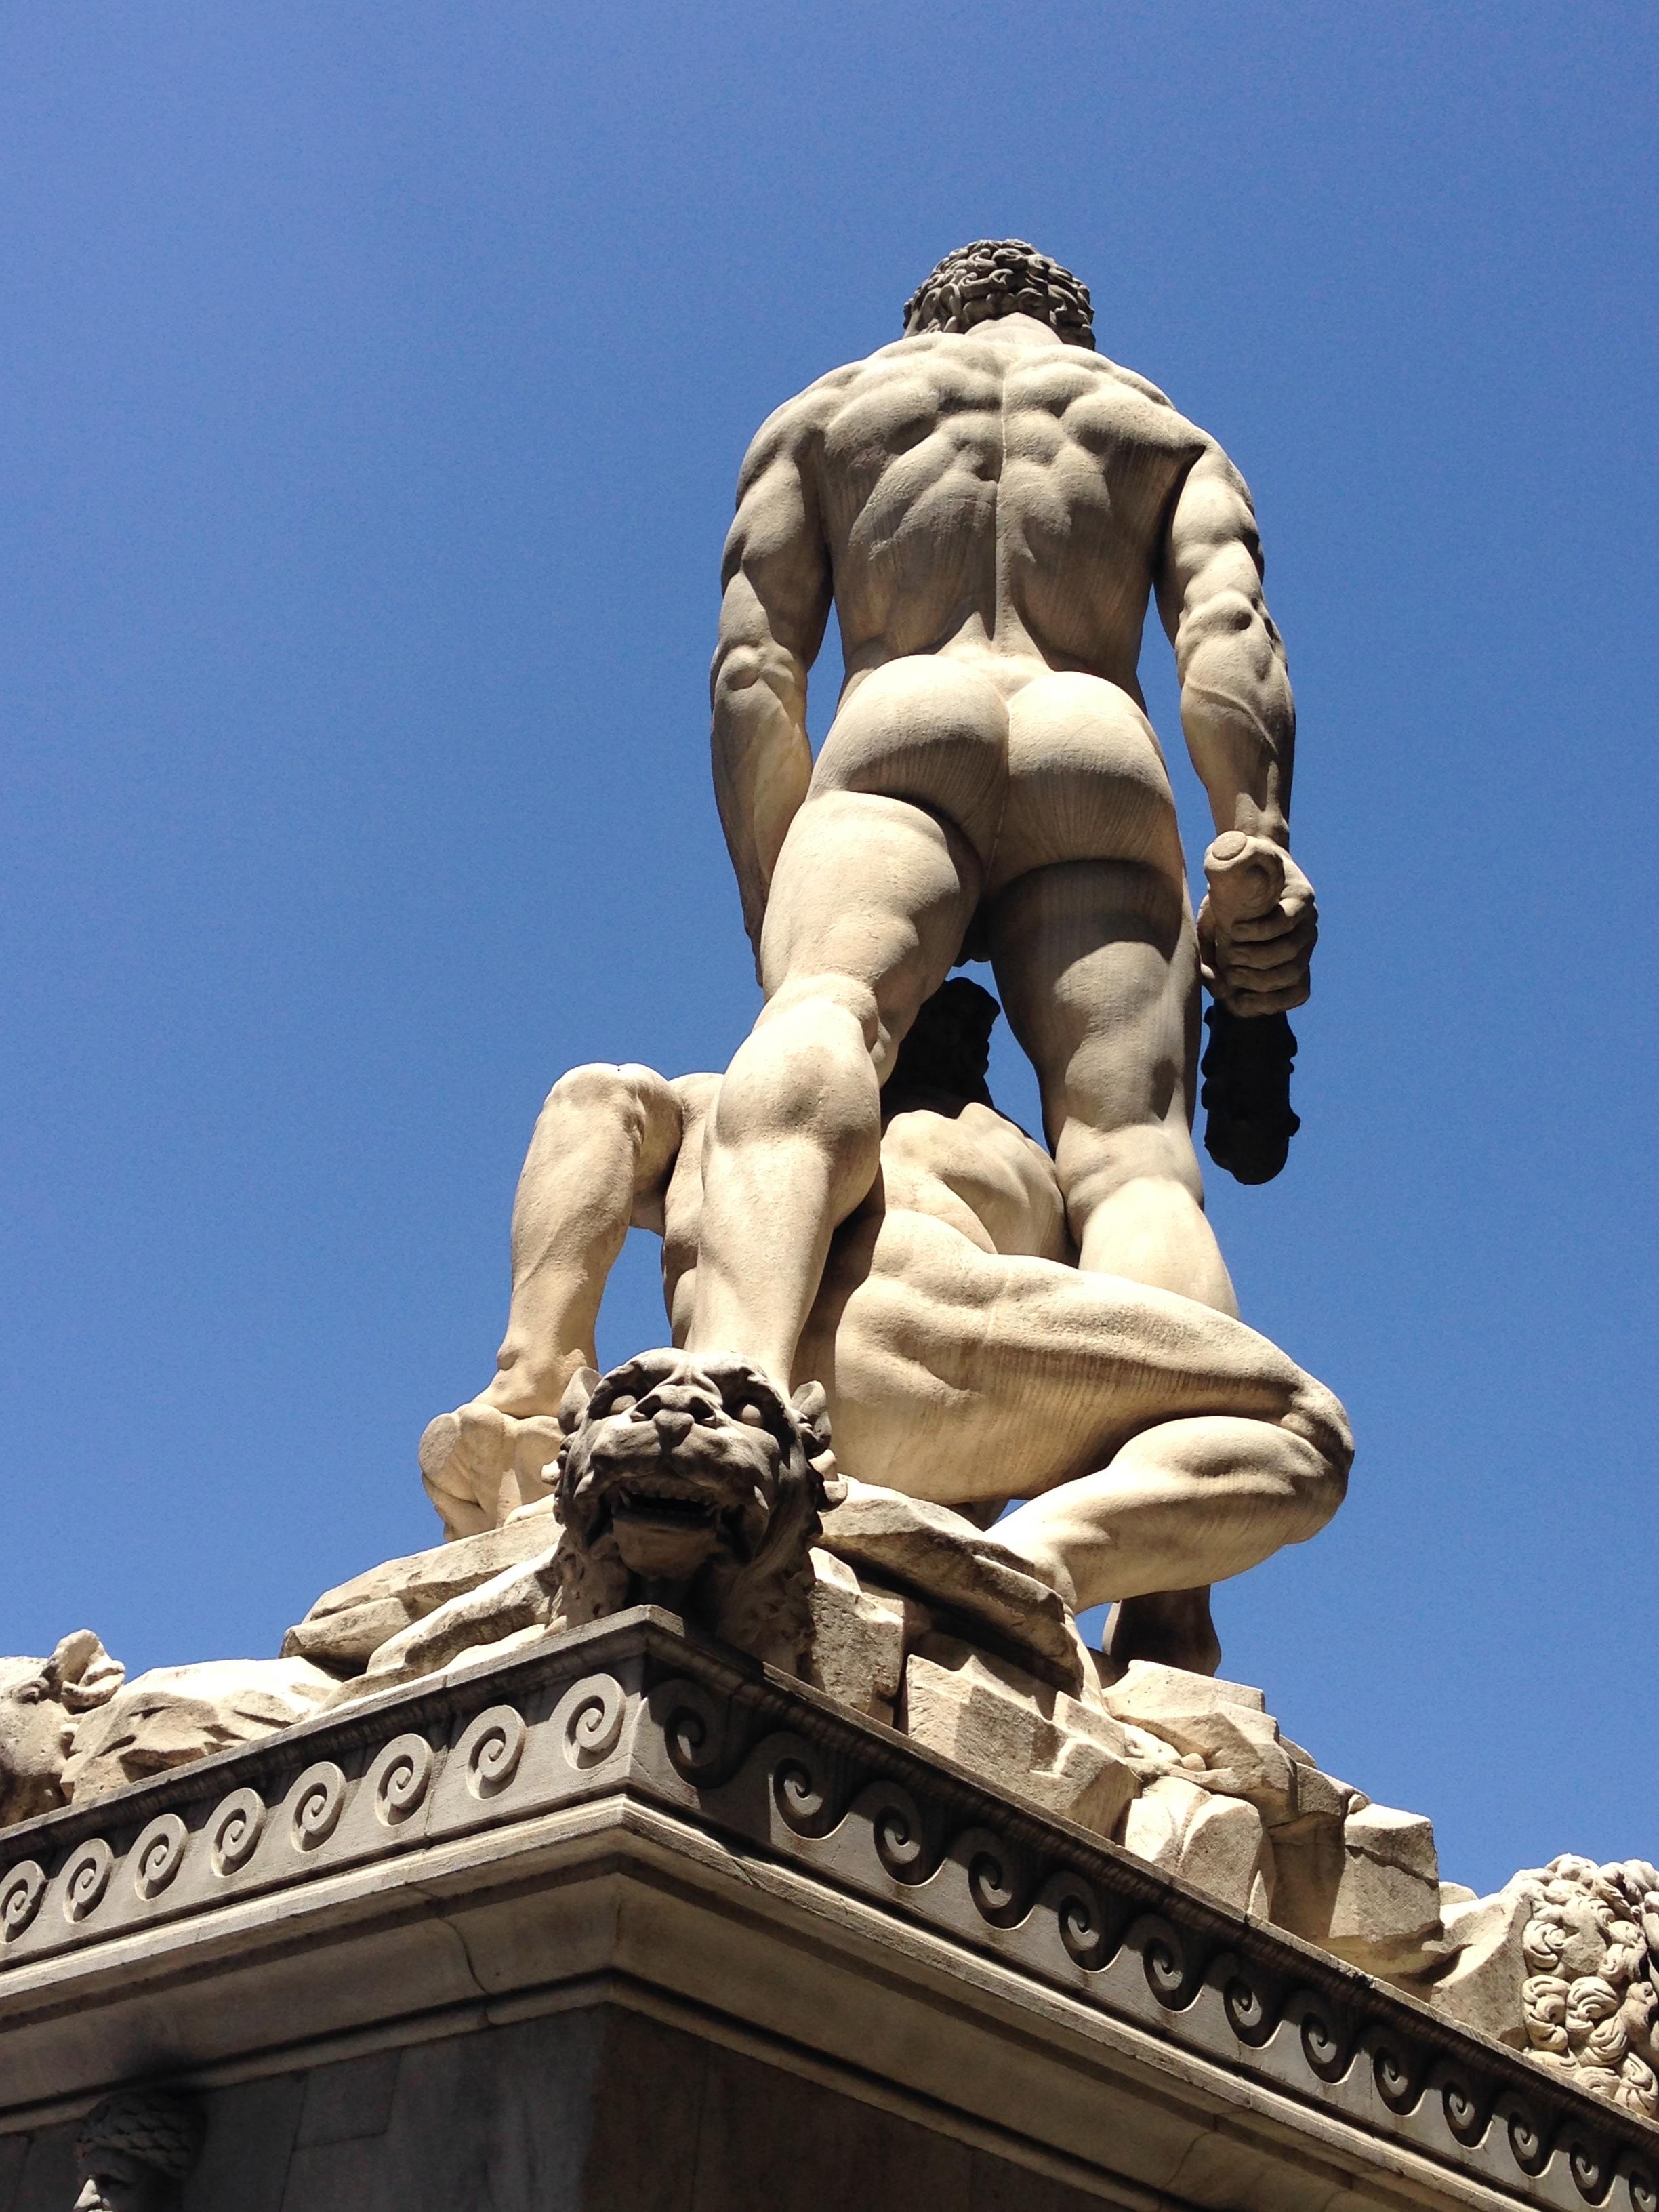 TT_SkySculpture_Florence.jpg